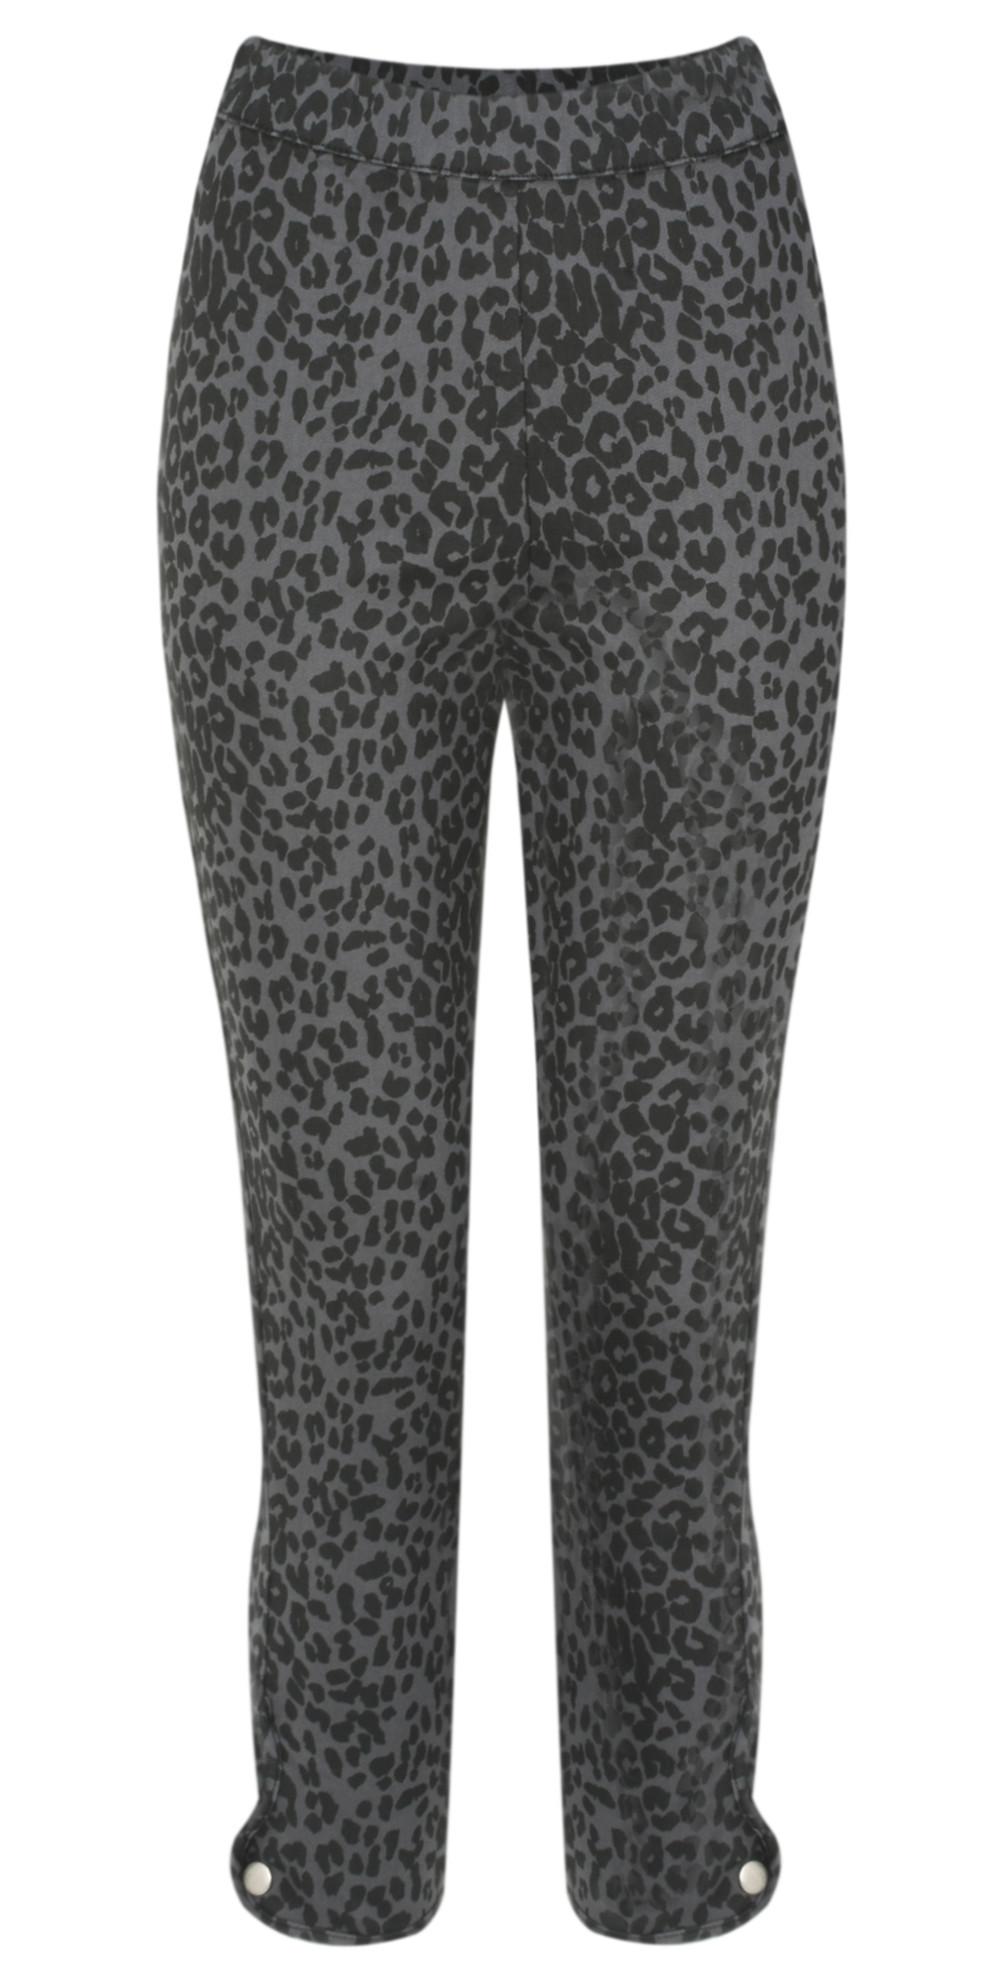 Paca Leopard Print Capri Trouser main image